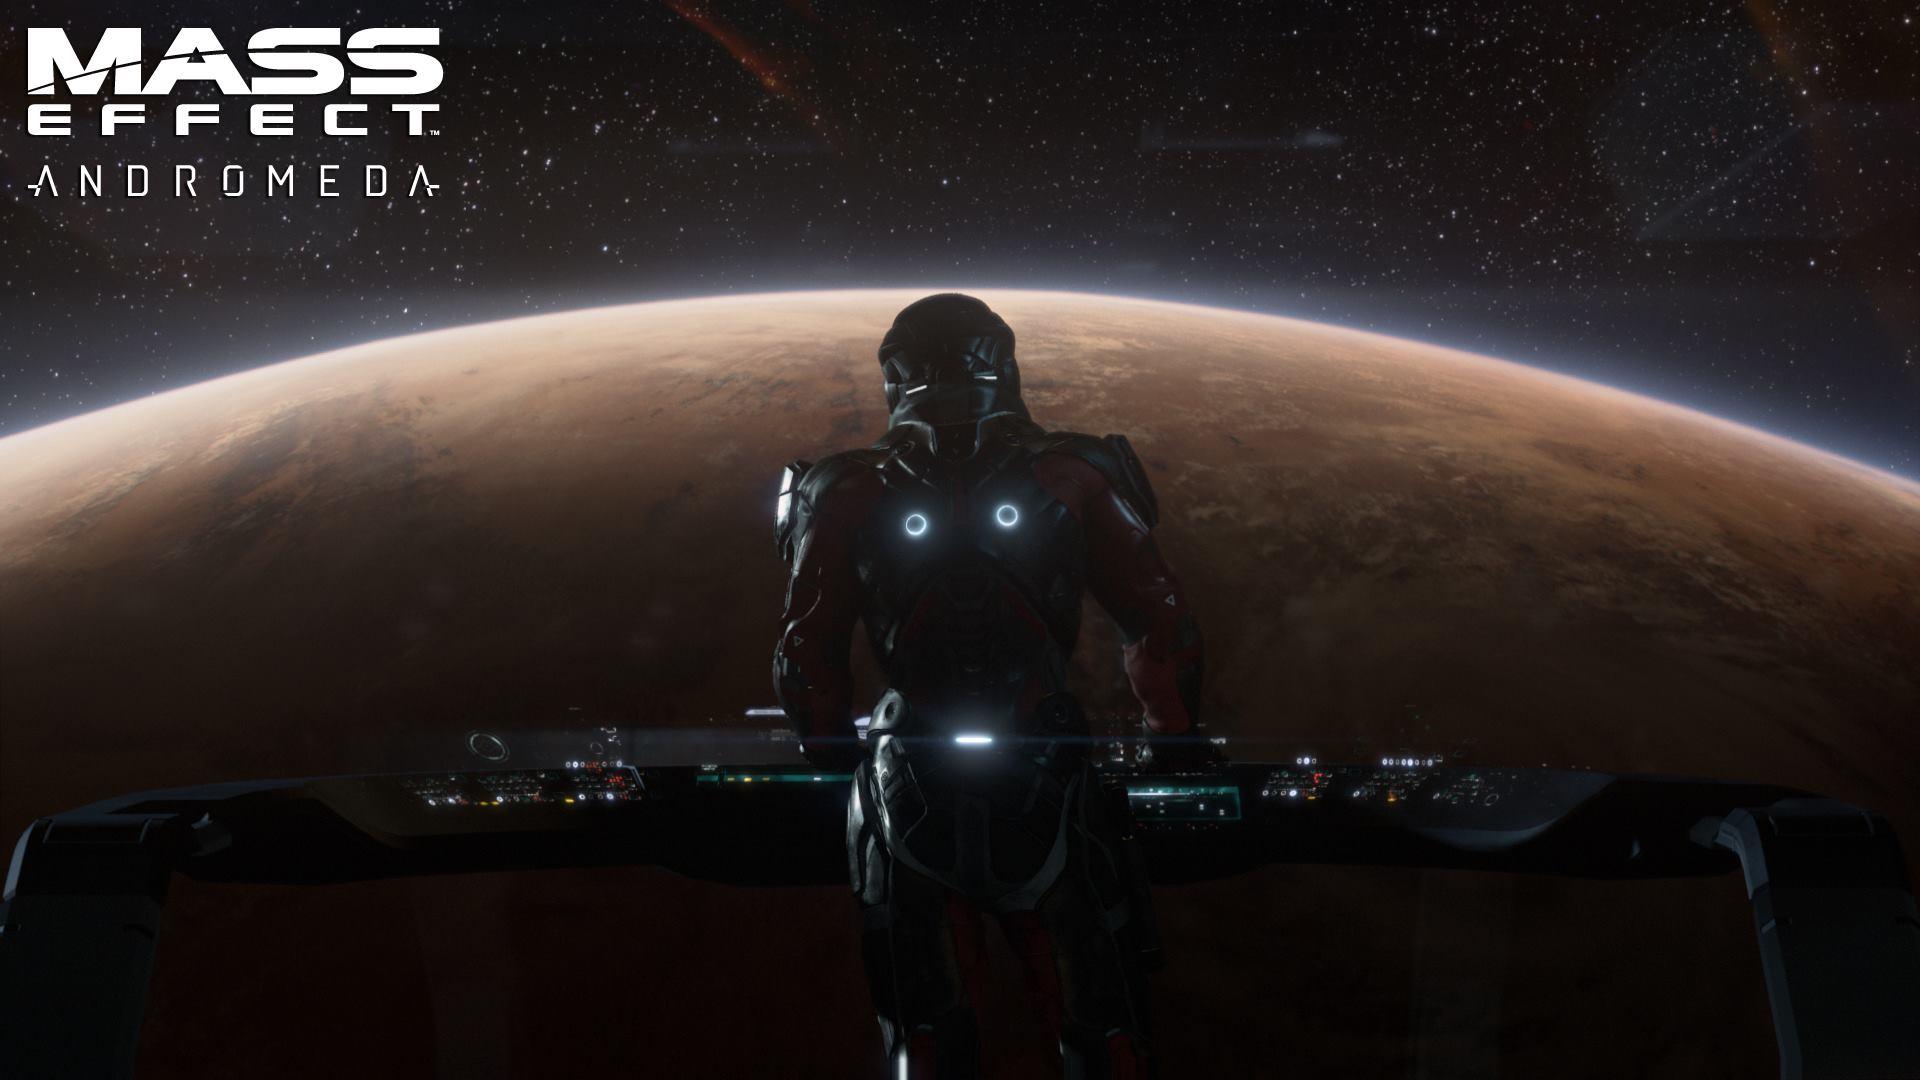 Mass Effect 3 Live Wallpaper Picserio Com